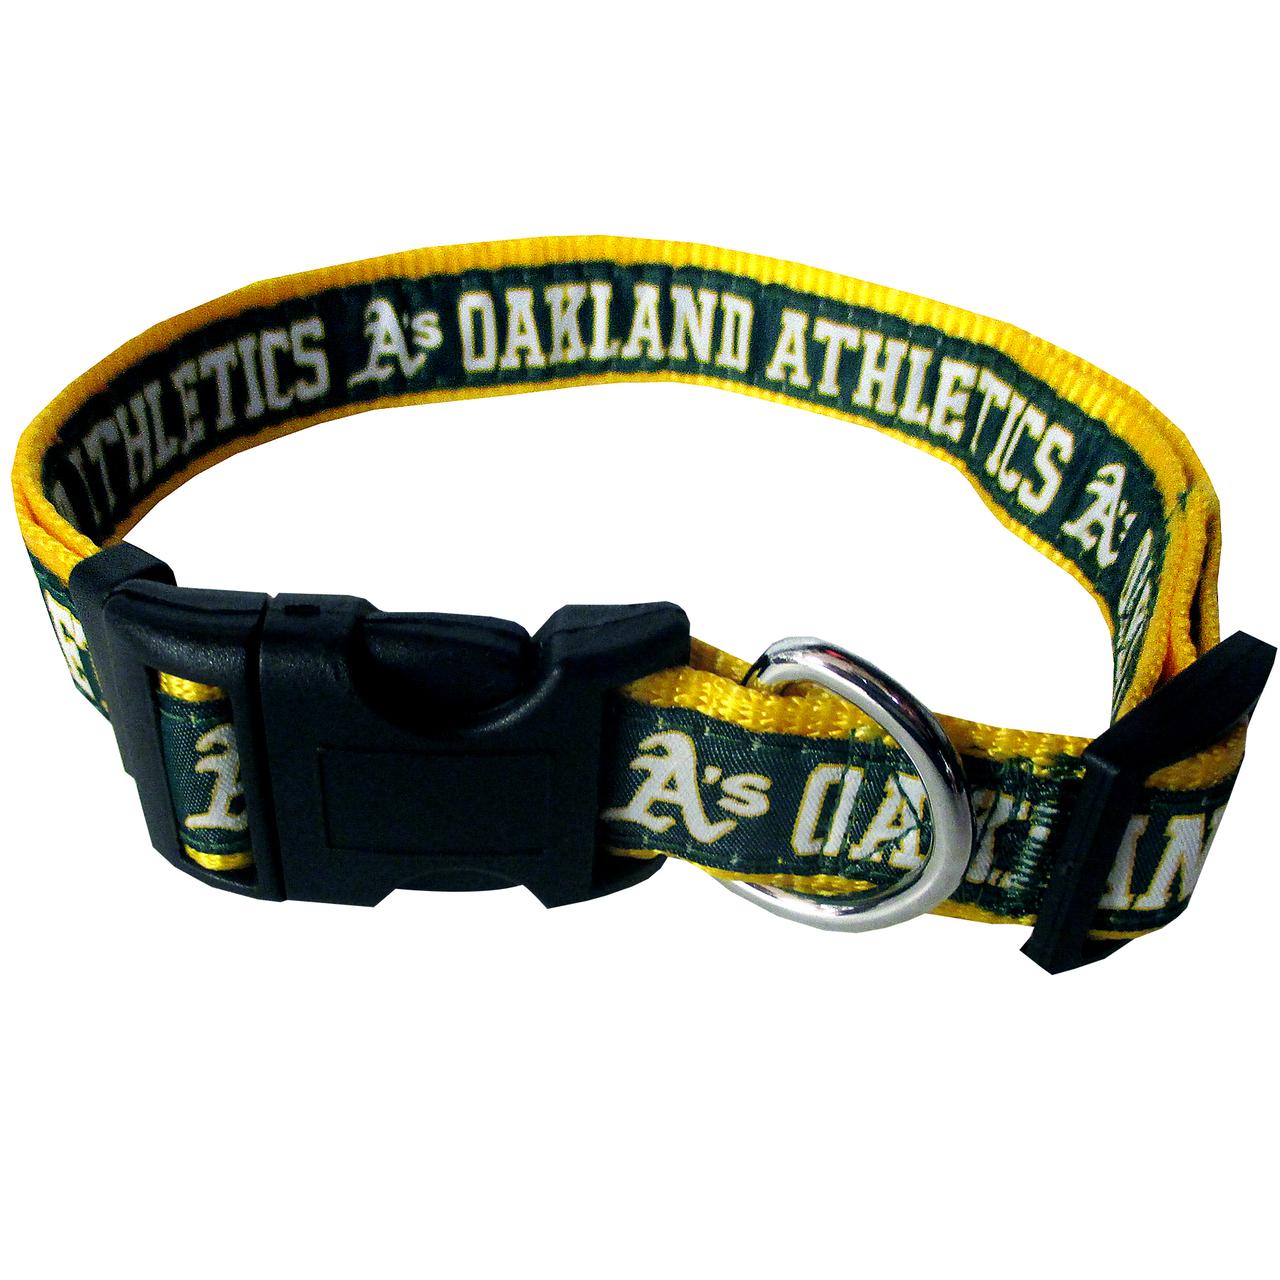 Hot Dog Oakland Athletics Dog COLLAR